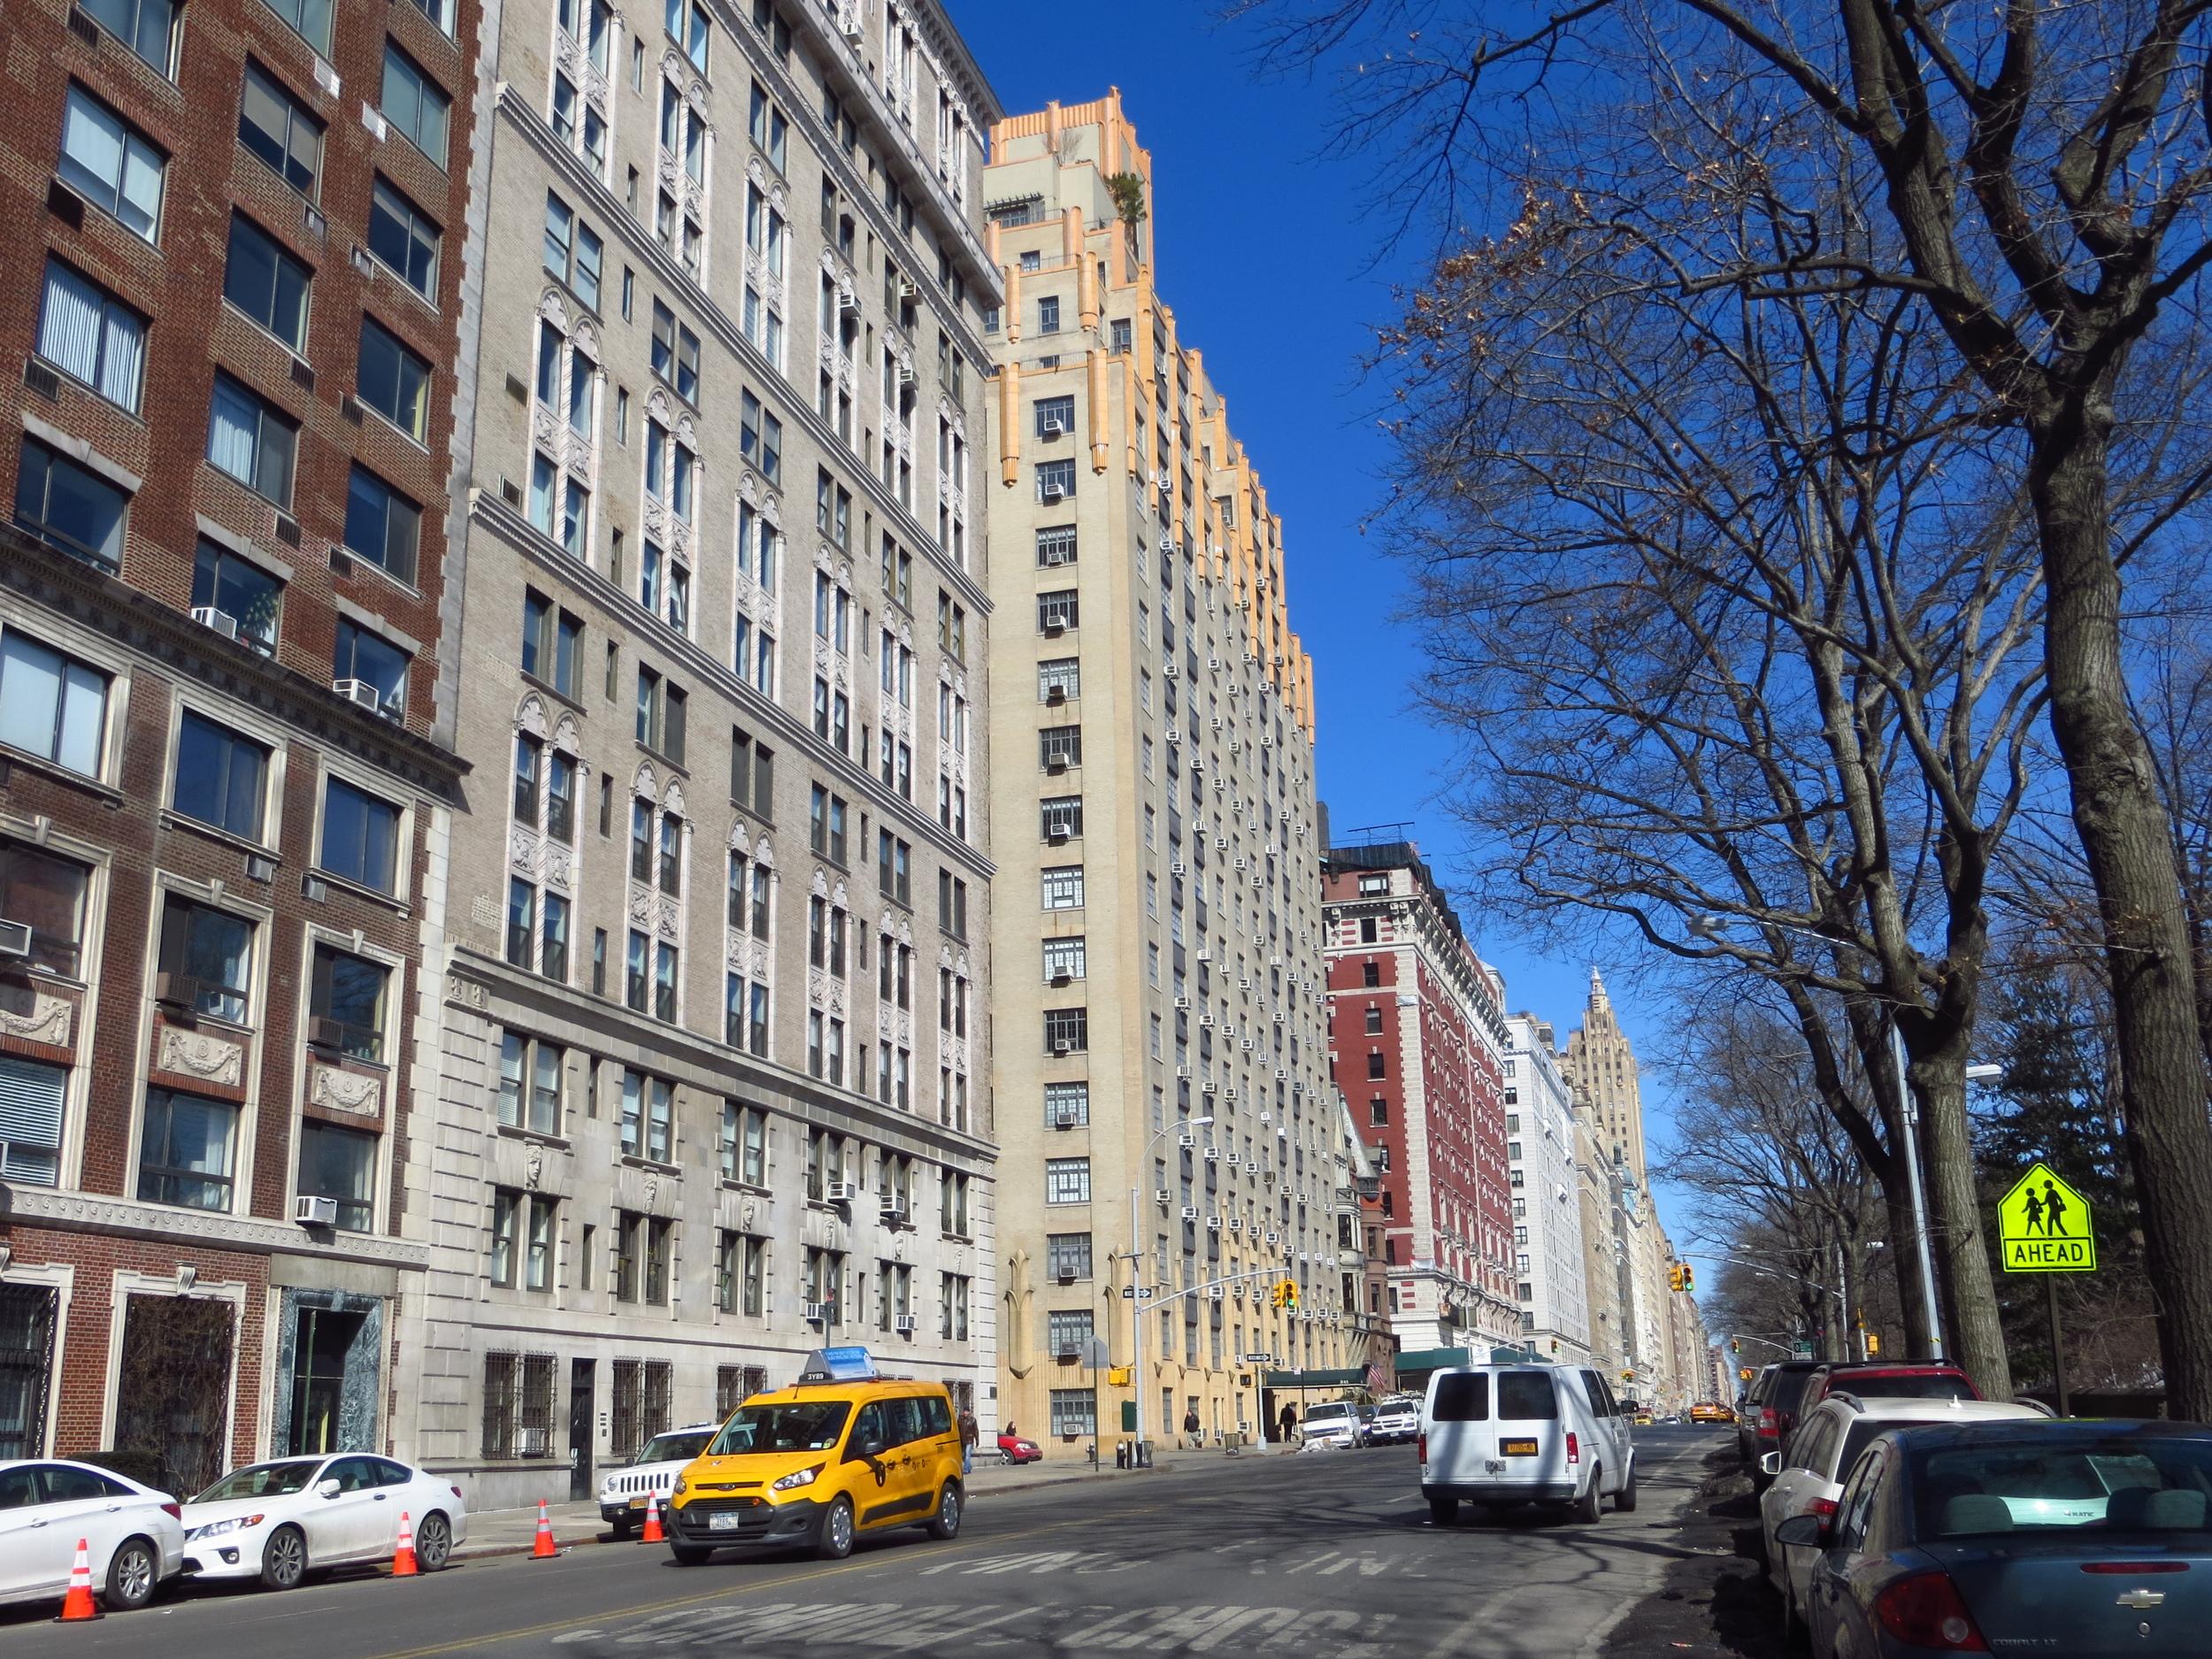 View up Central Park West